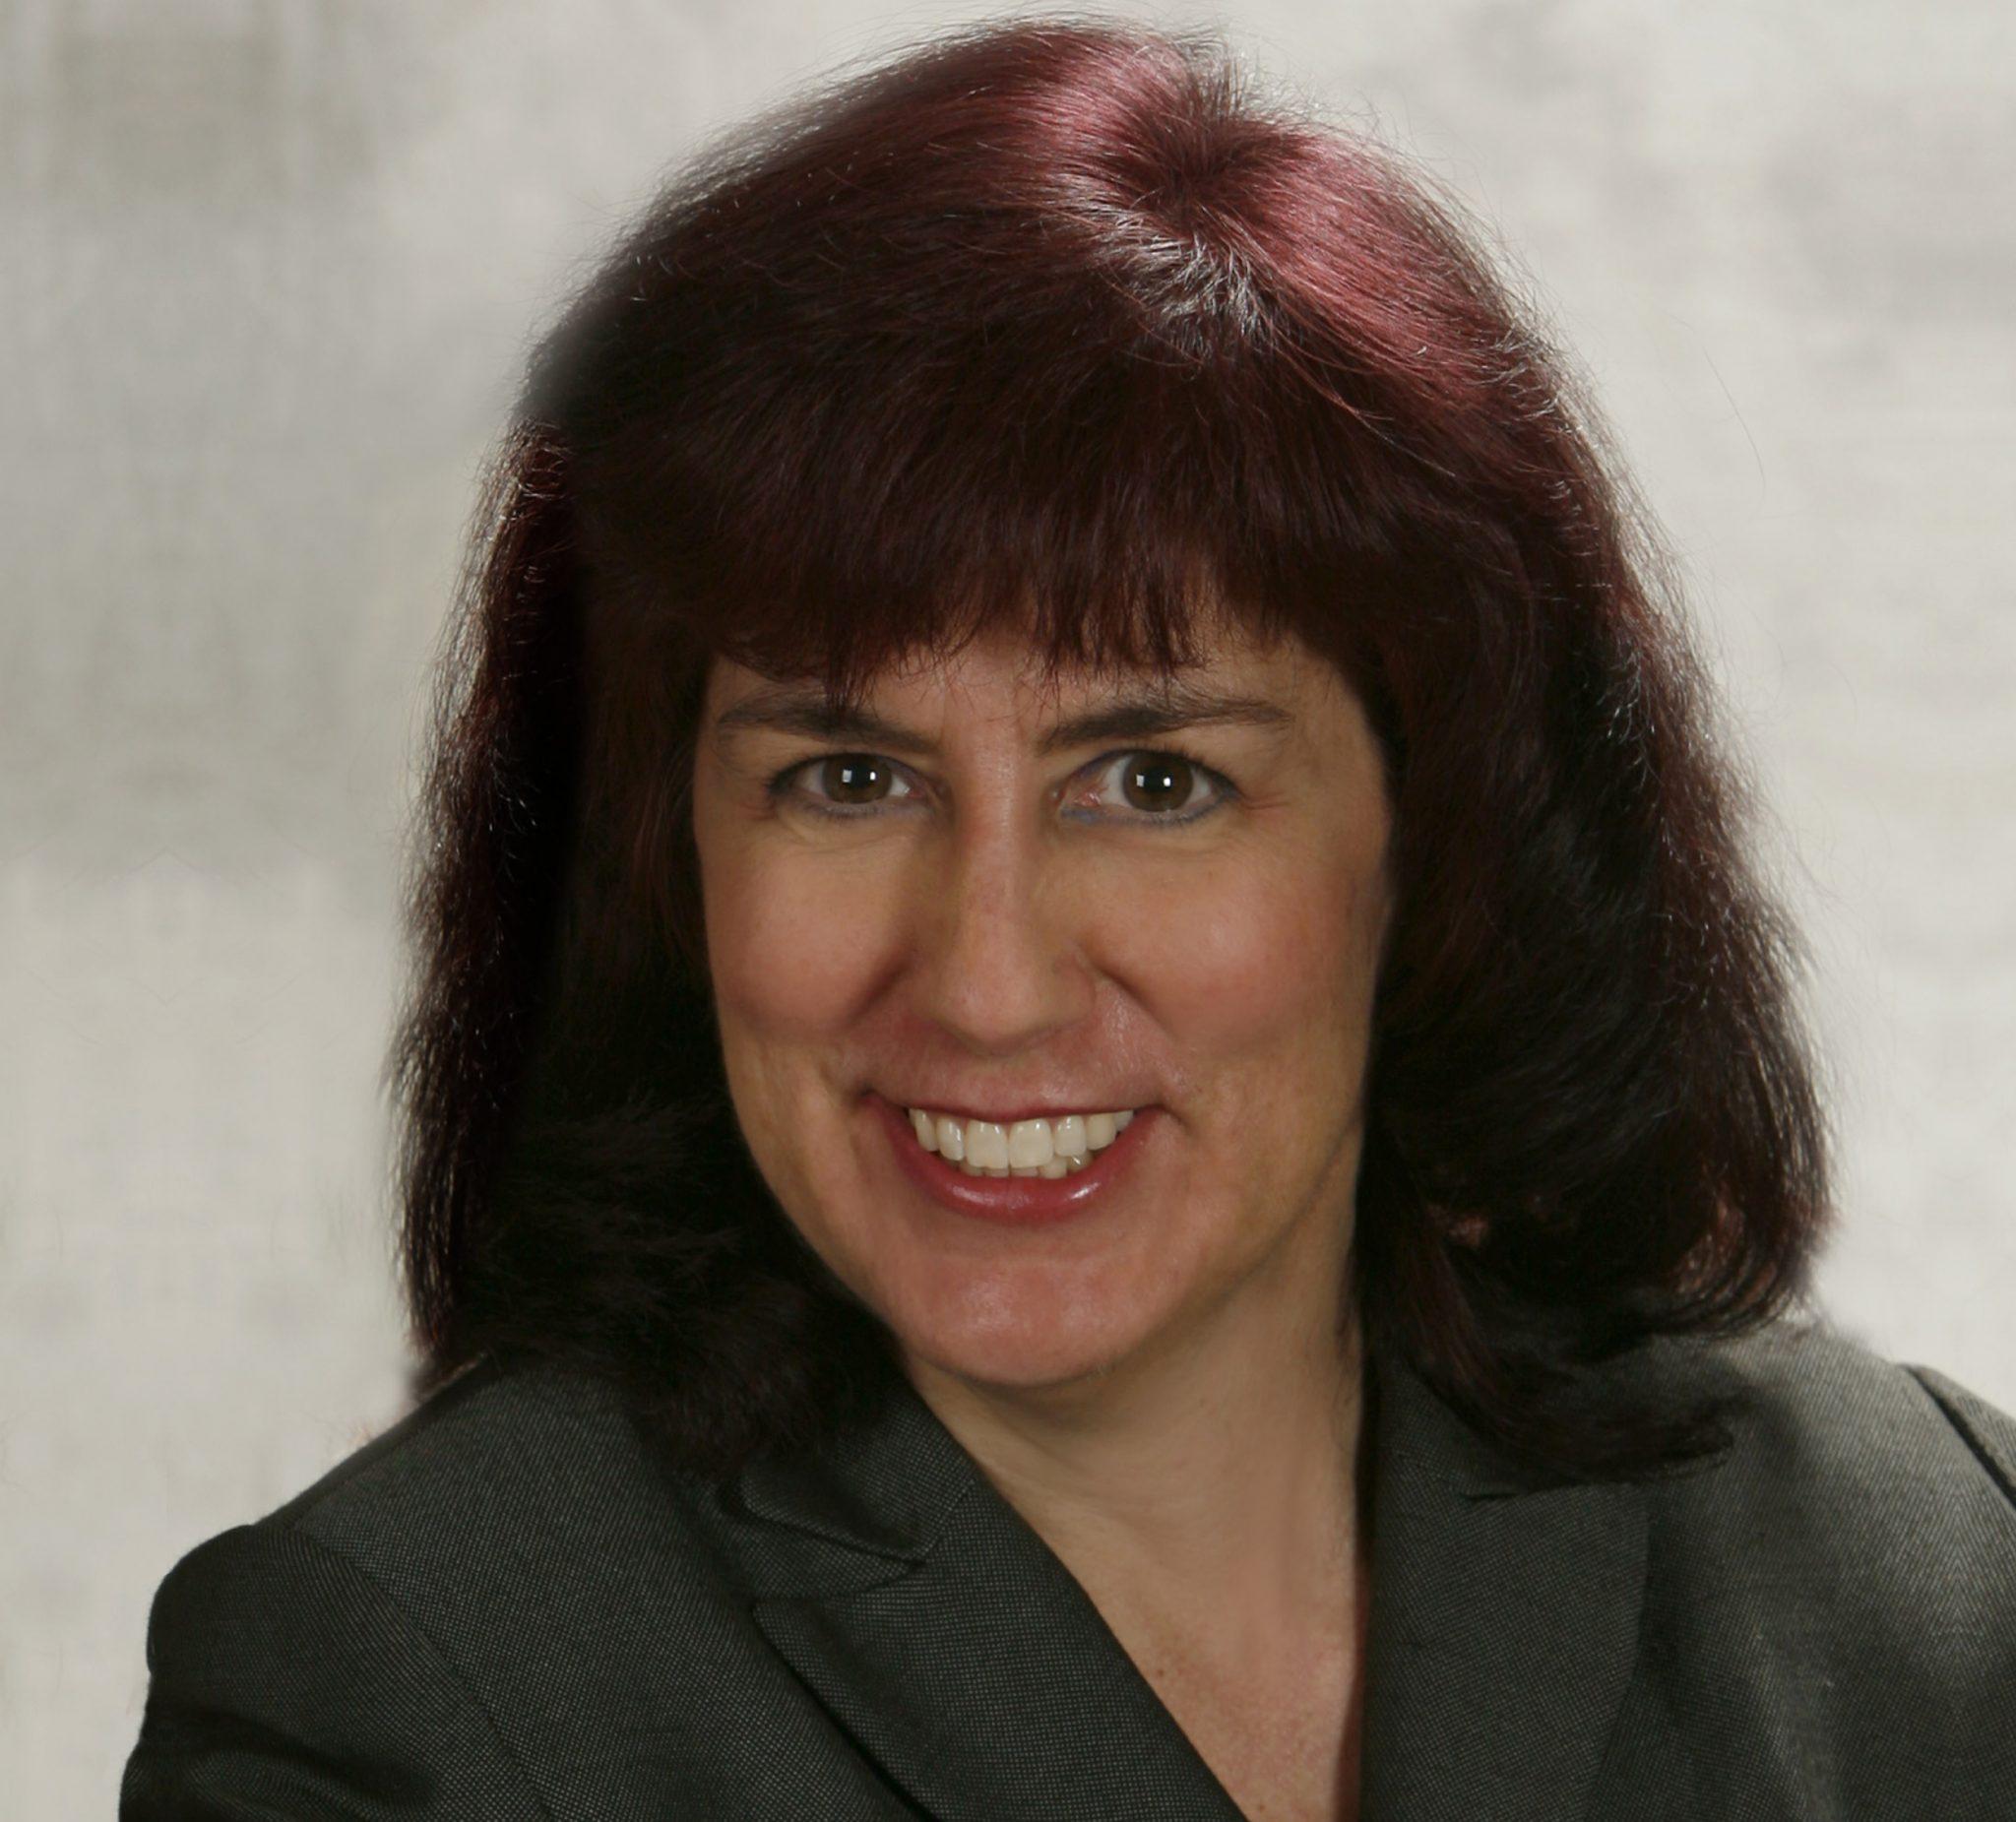 Leslie Messineo